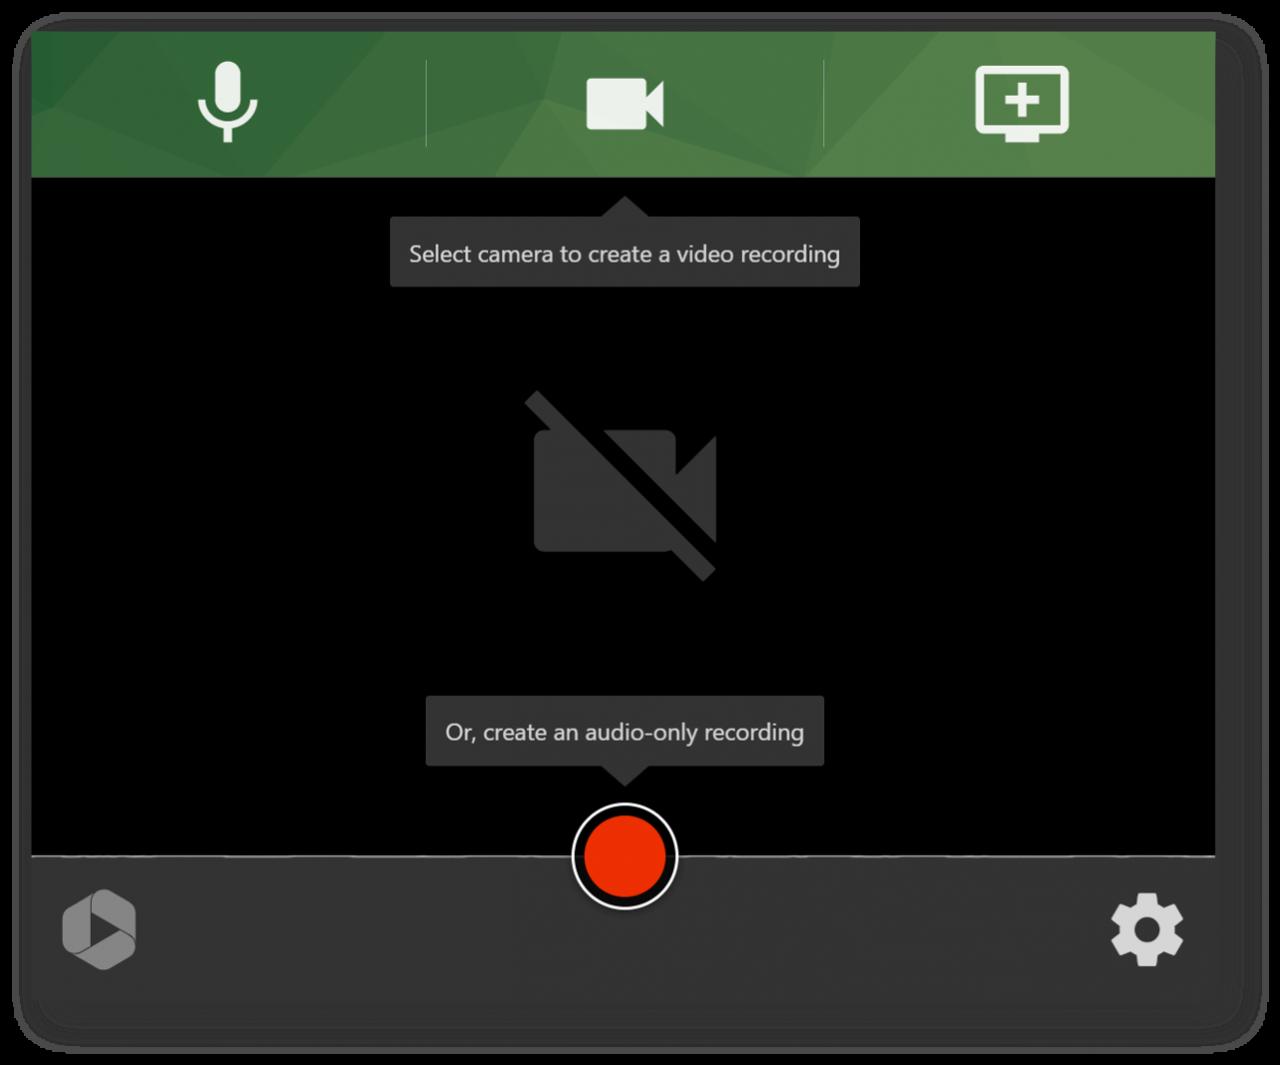 WEB会議やオンラインミーティングを記録する無料のスクリーンレコーダー